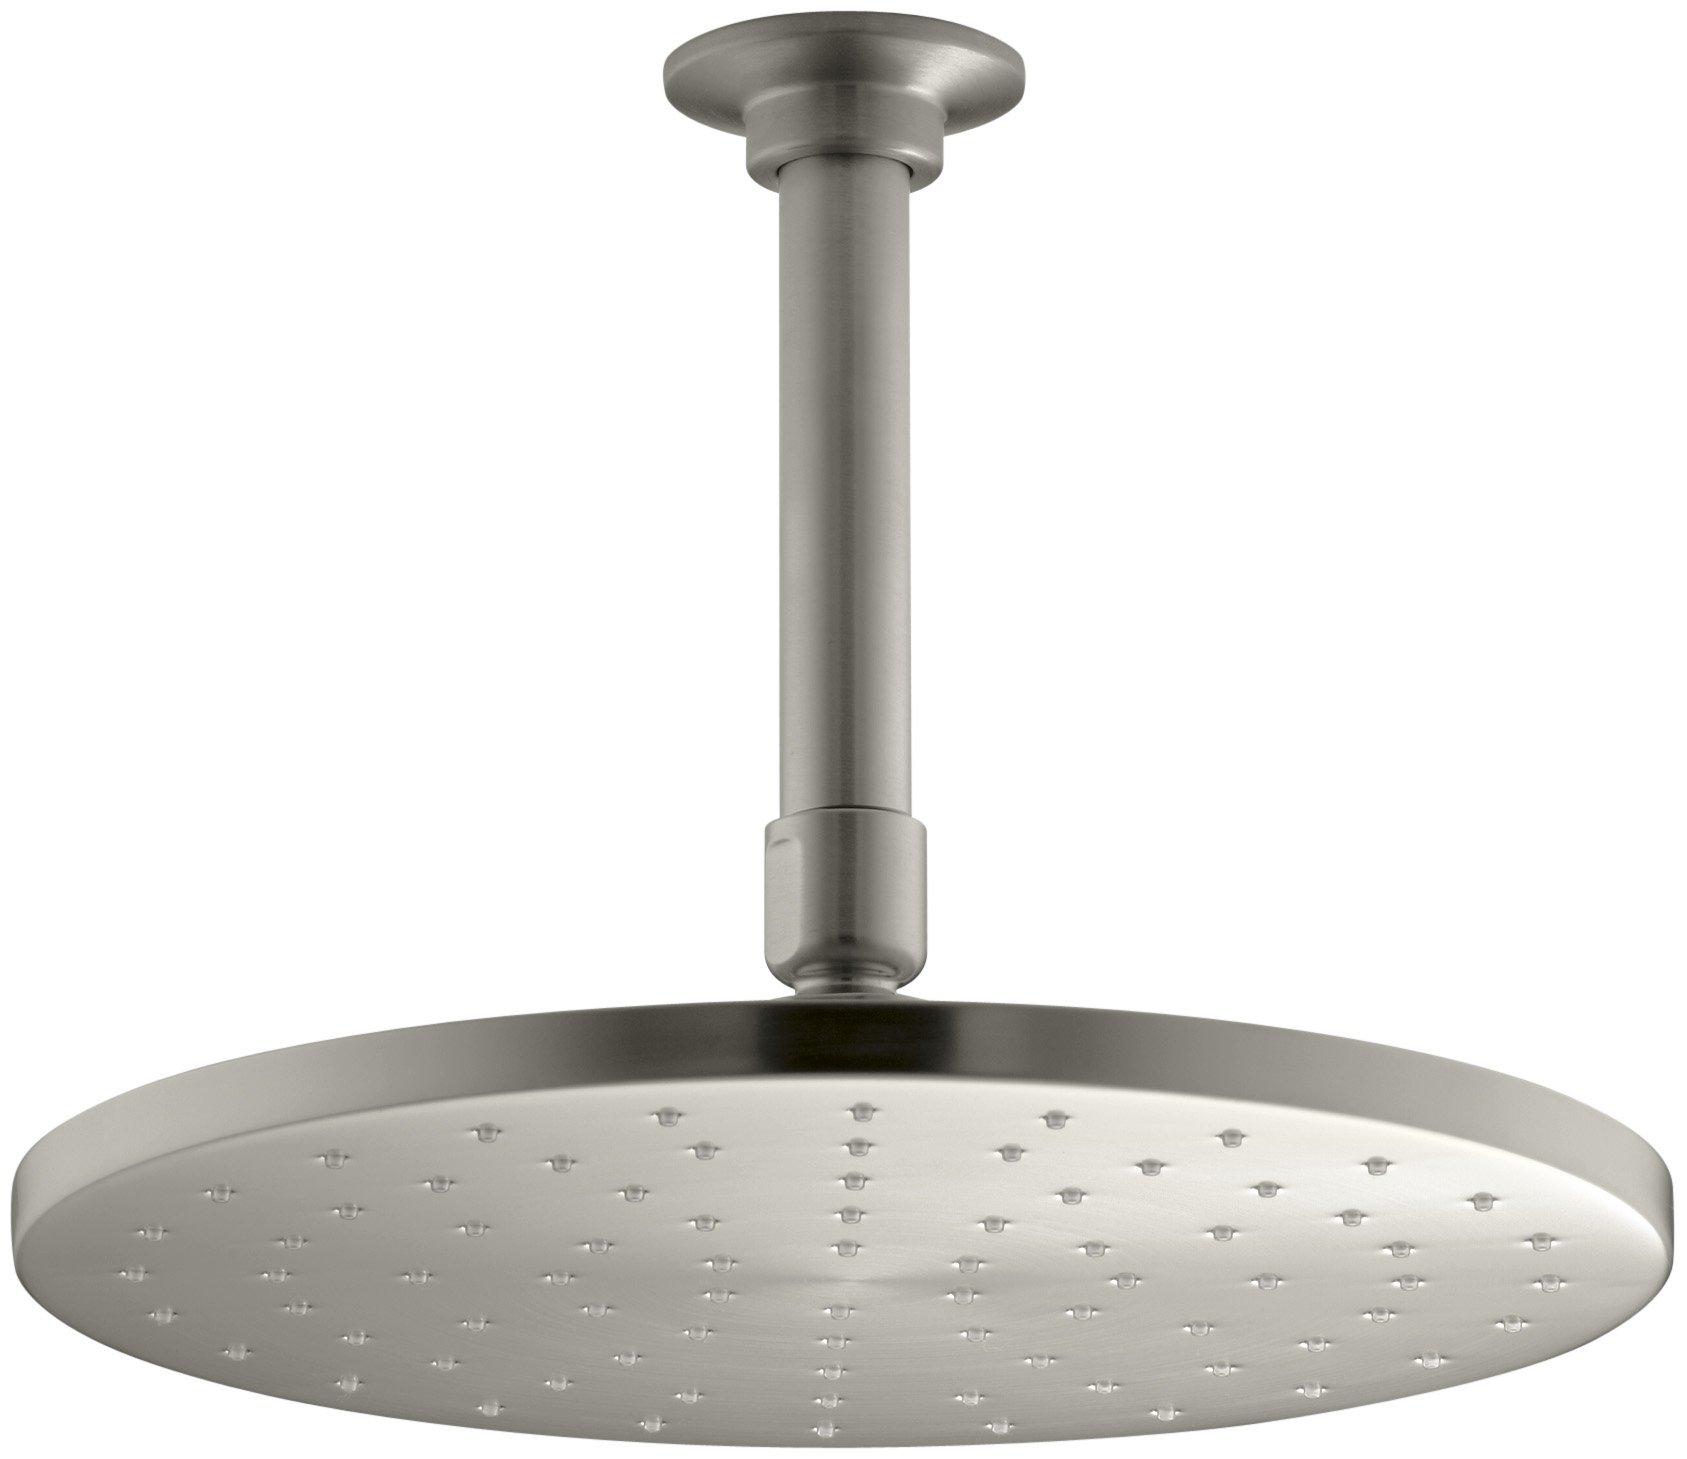 KOHLER K-13689-BN 10-Inch Contemporary Round Rain Showerhead, Vibrant Brushed Nickel by Kohler (Image #1)